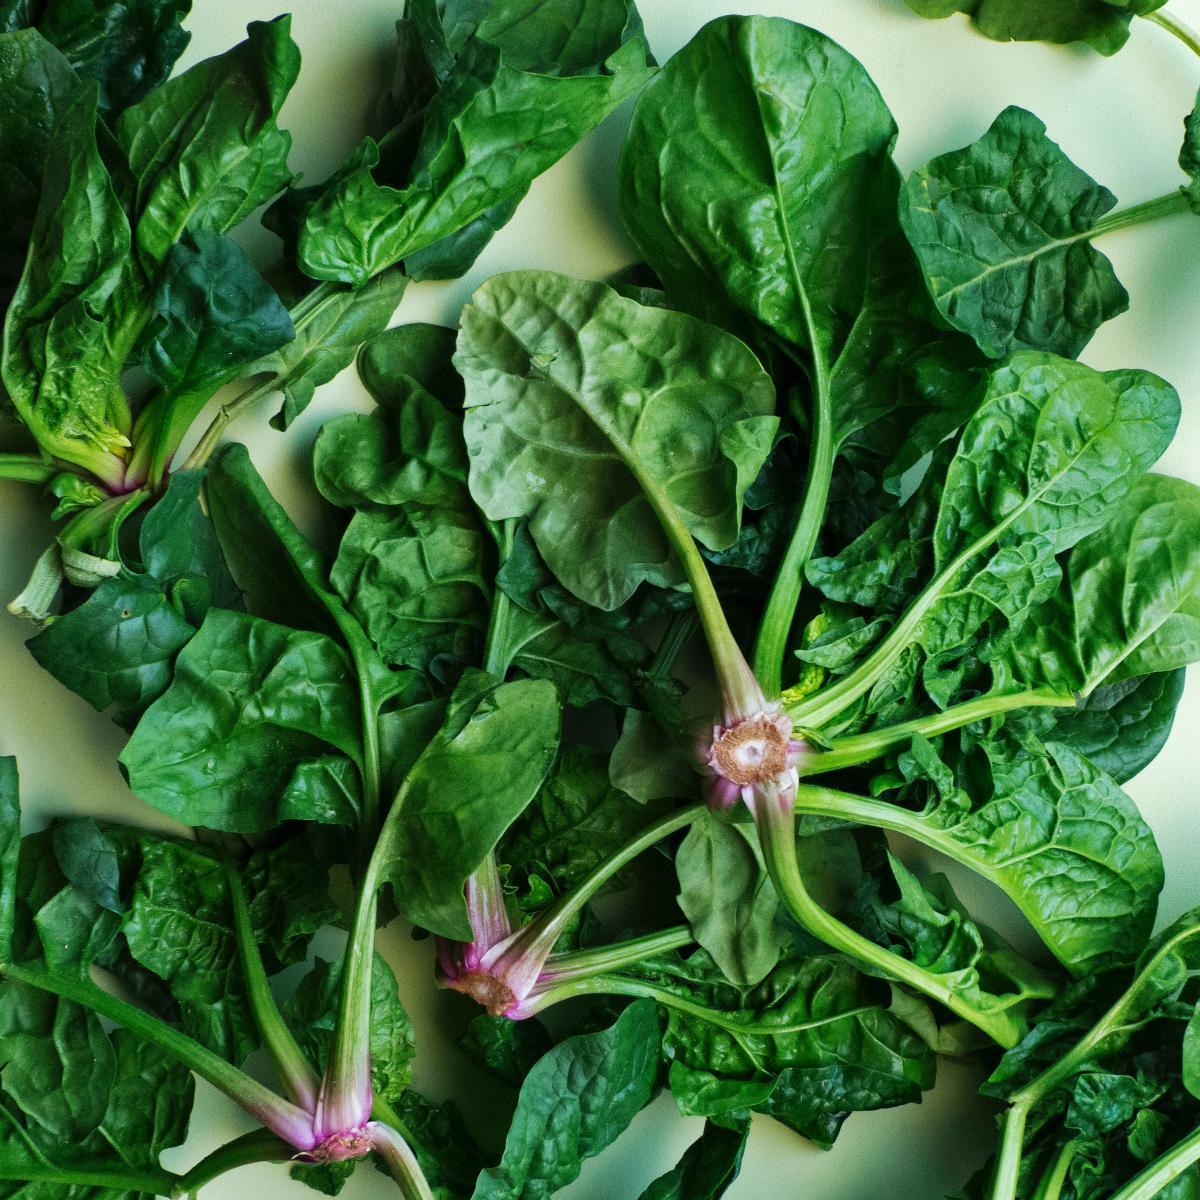 Greens Vegetable Produce #425435